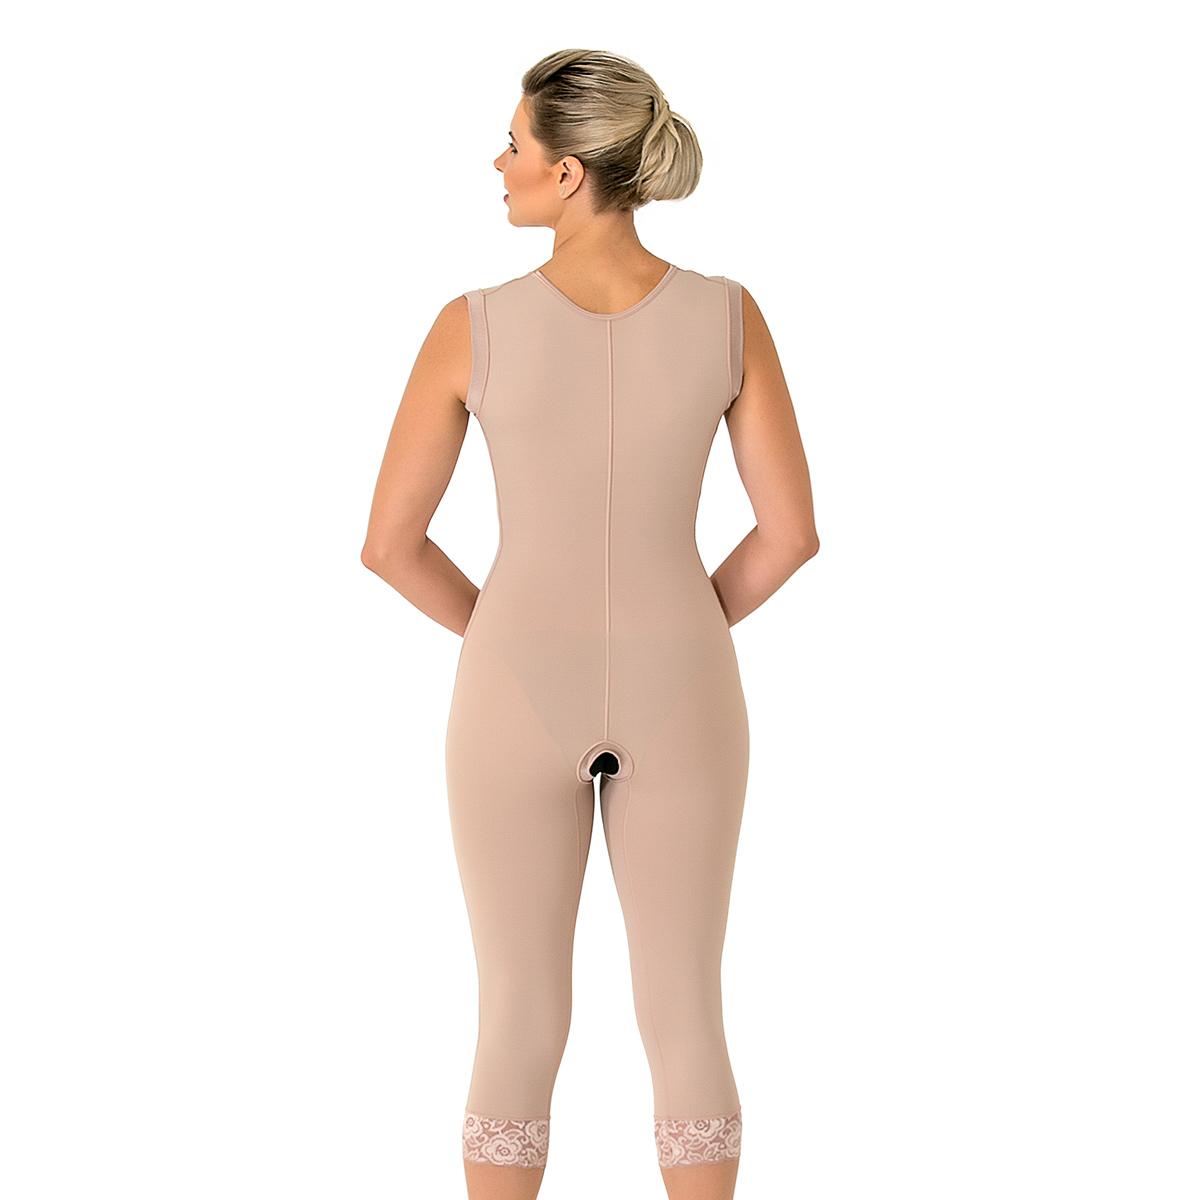 Modelador cirúrgico compressivo longo sem busto Mabella 1052 lipo na barriga dorso gluteoplastia prótese back shape coxa  - Cinta se Nova